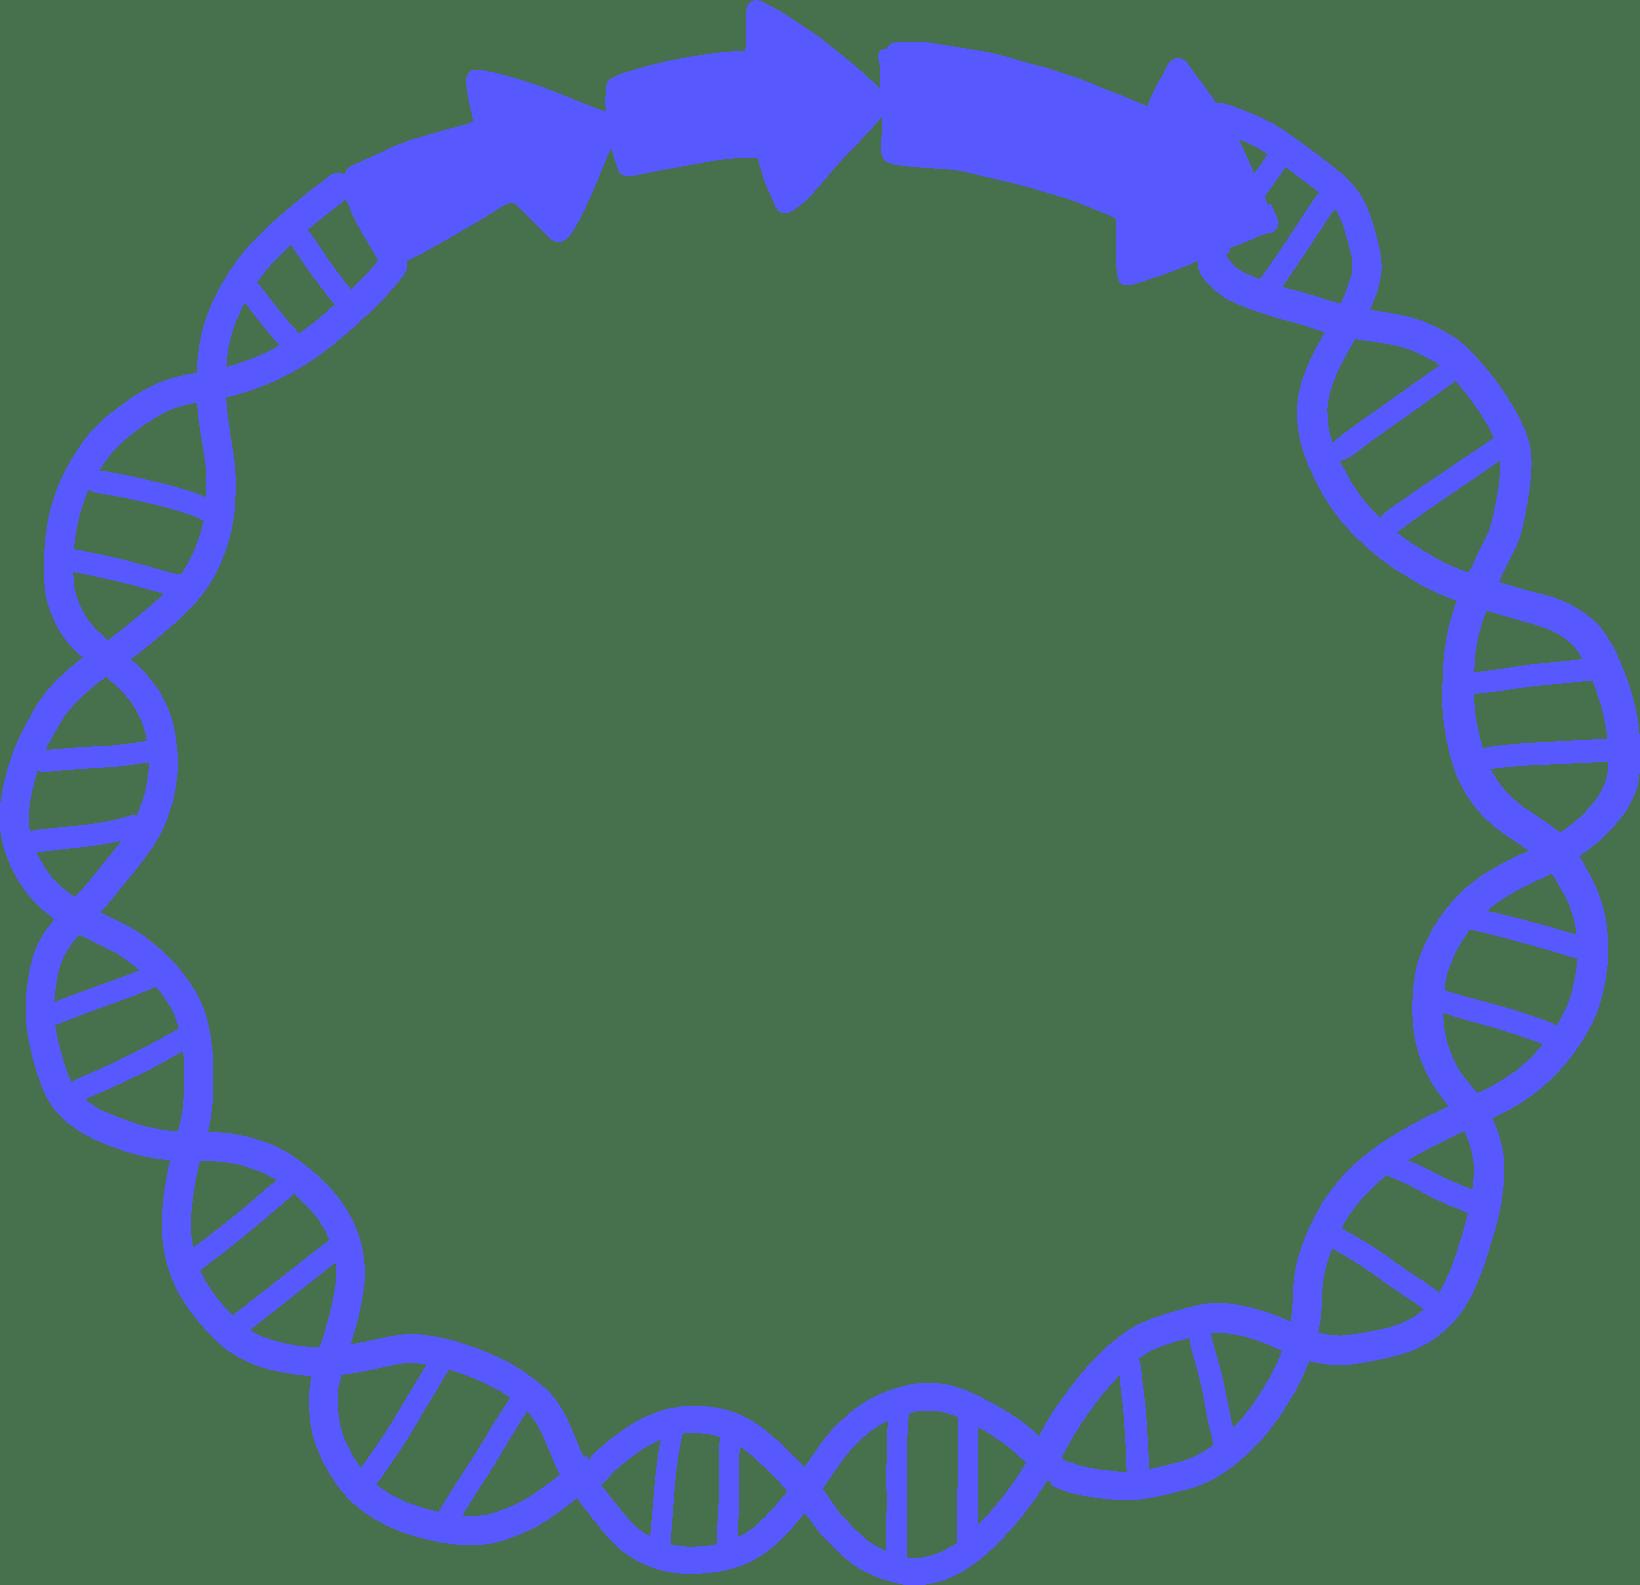 Illustration of a plasmid